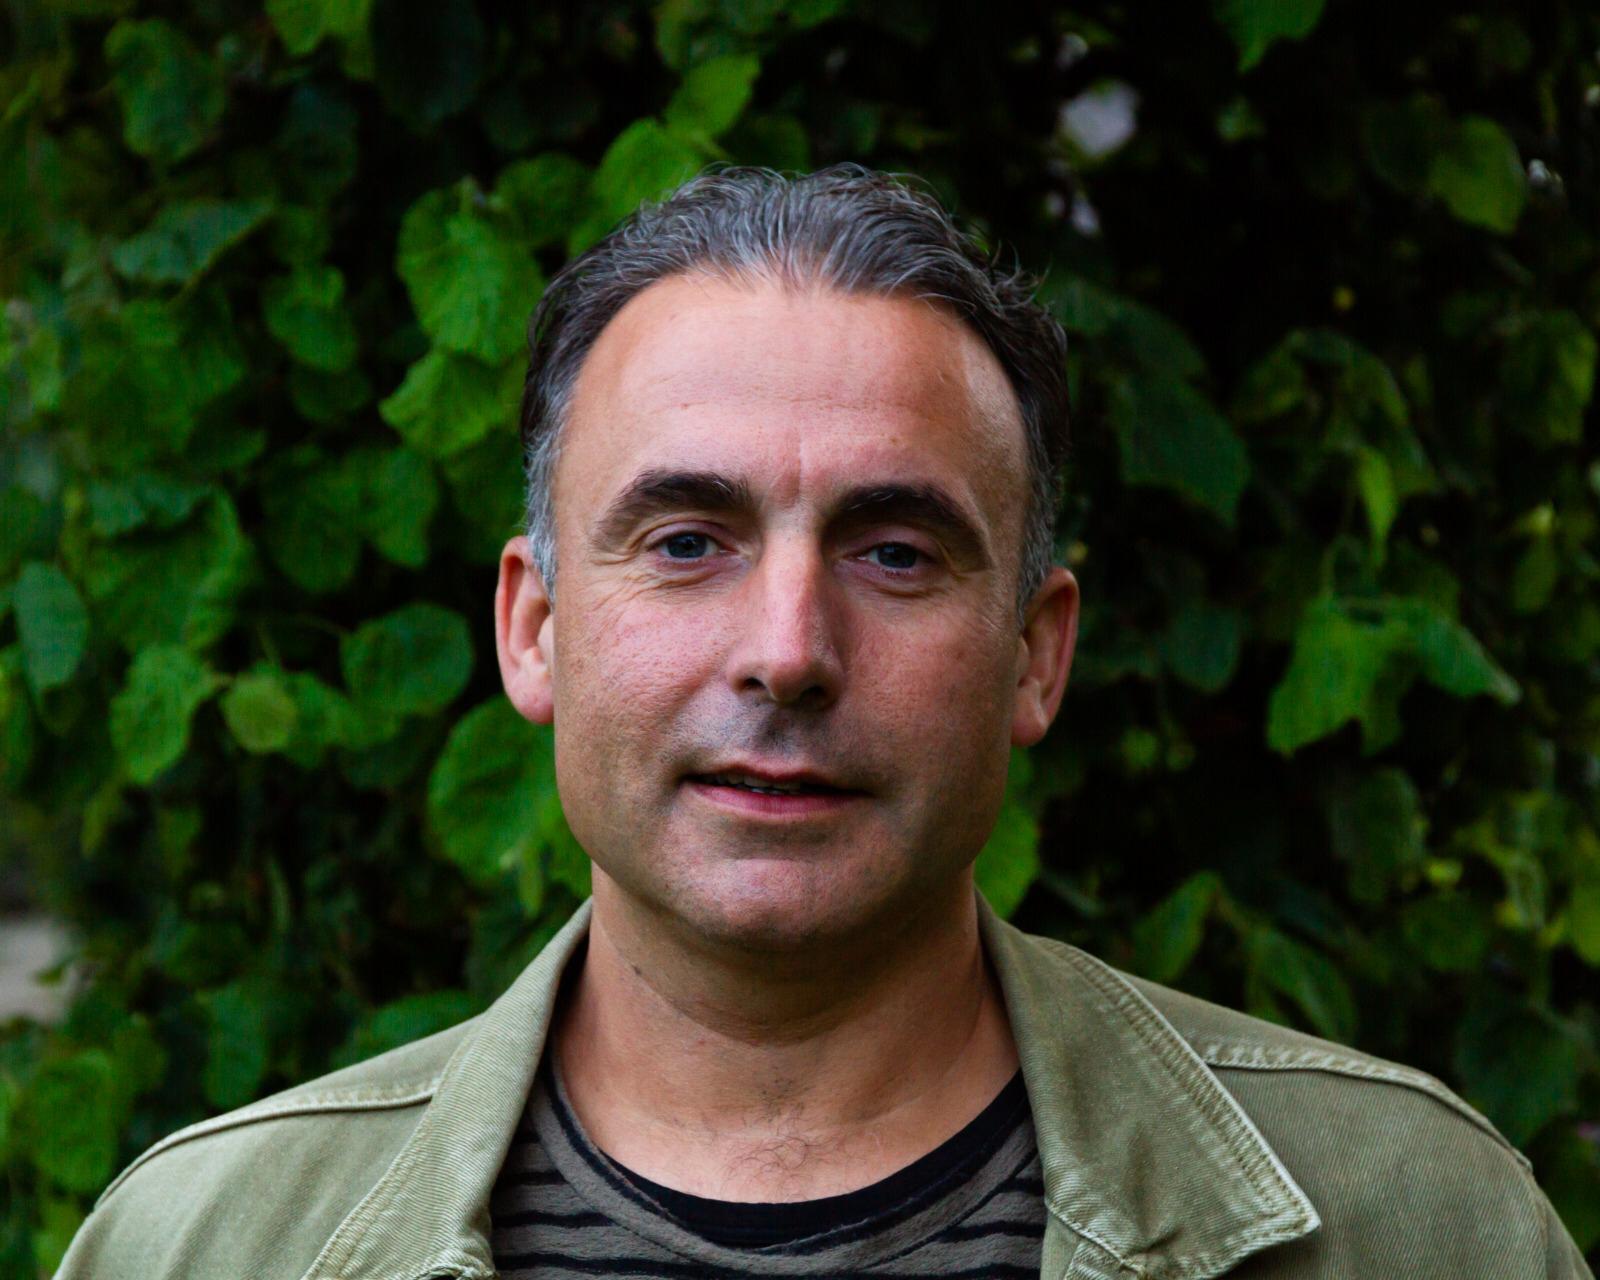 Richard20 Santinge